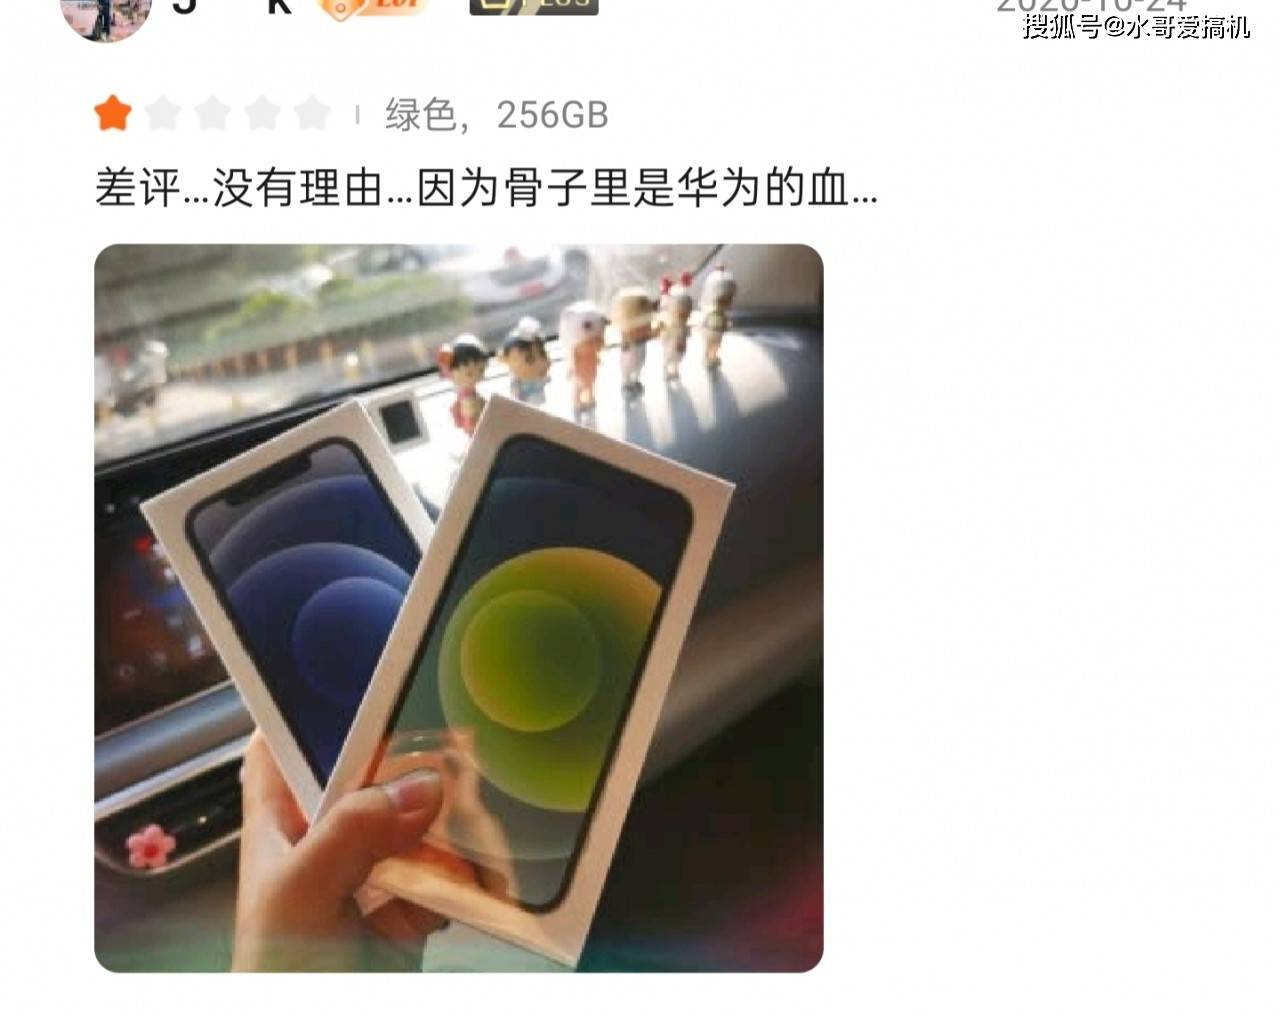 iPhone12差评出炉:骨子里是华为的血?